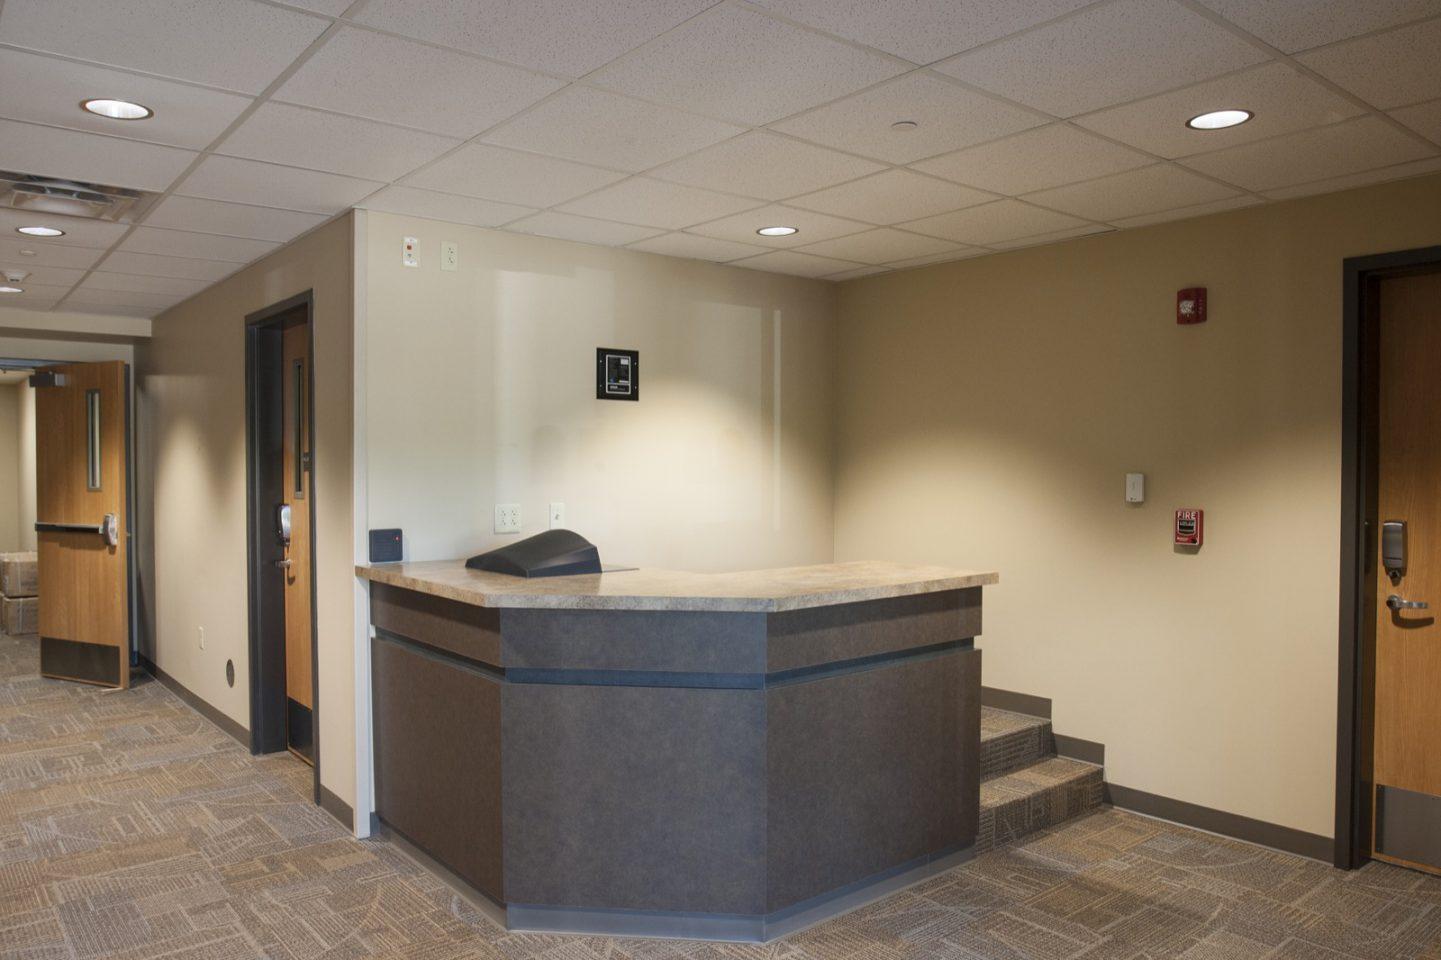 St. Ambrose North Hall concierge desk